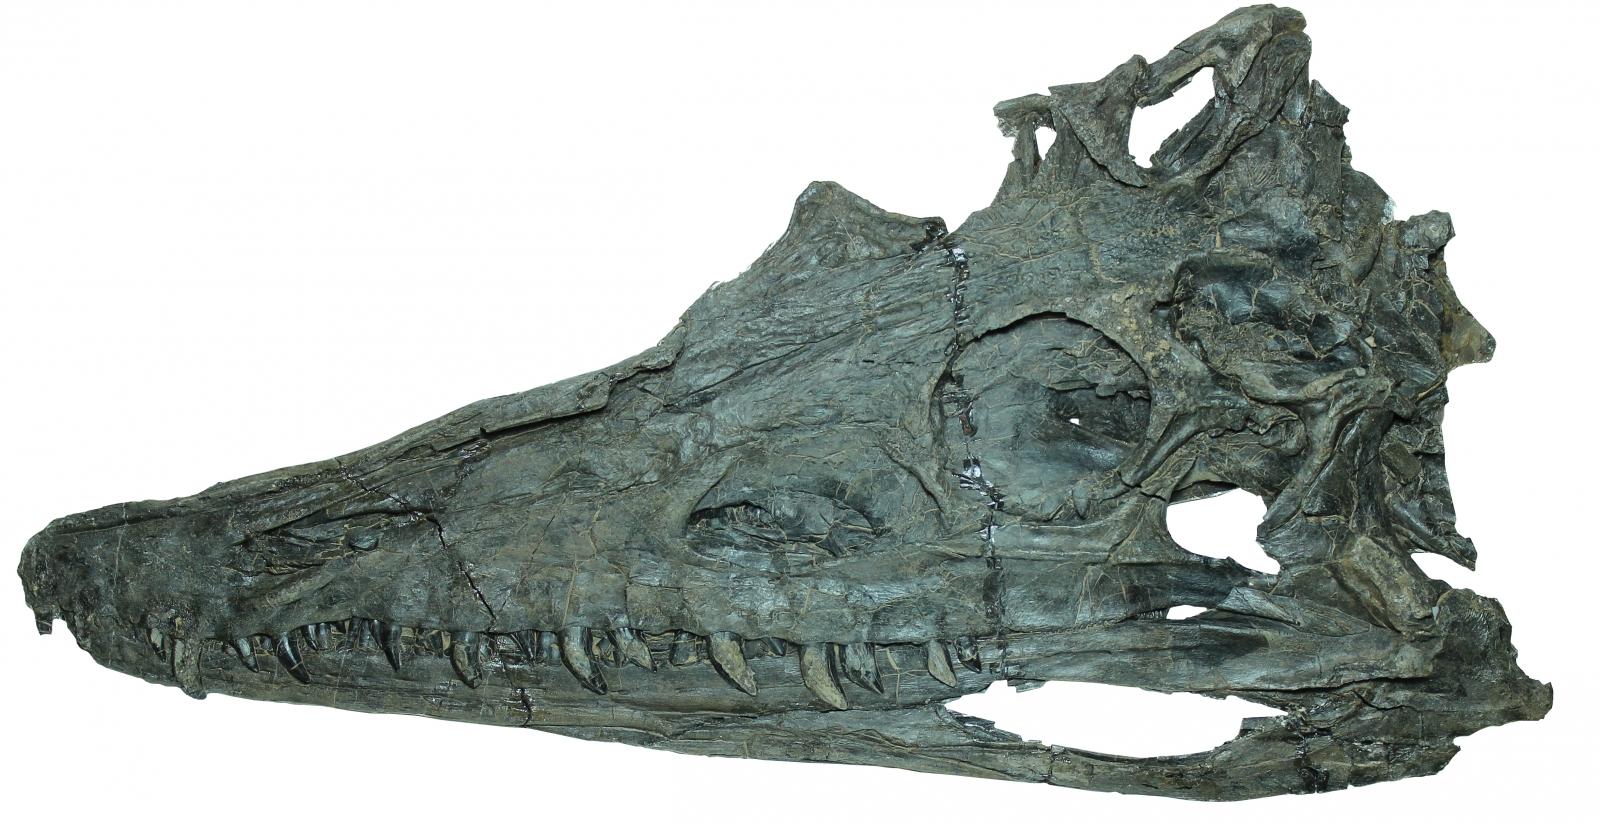 Diandongosuchus fuyuanensis